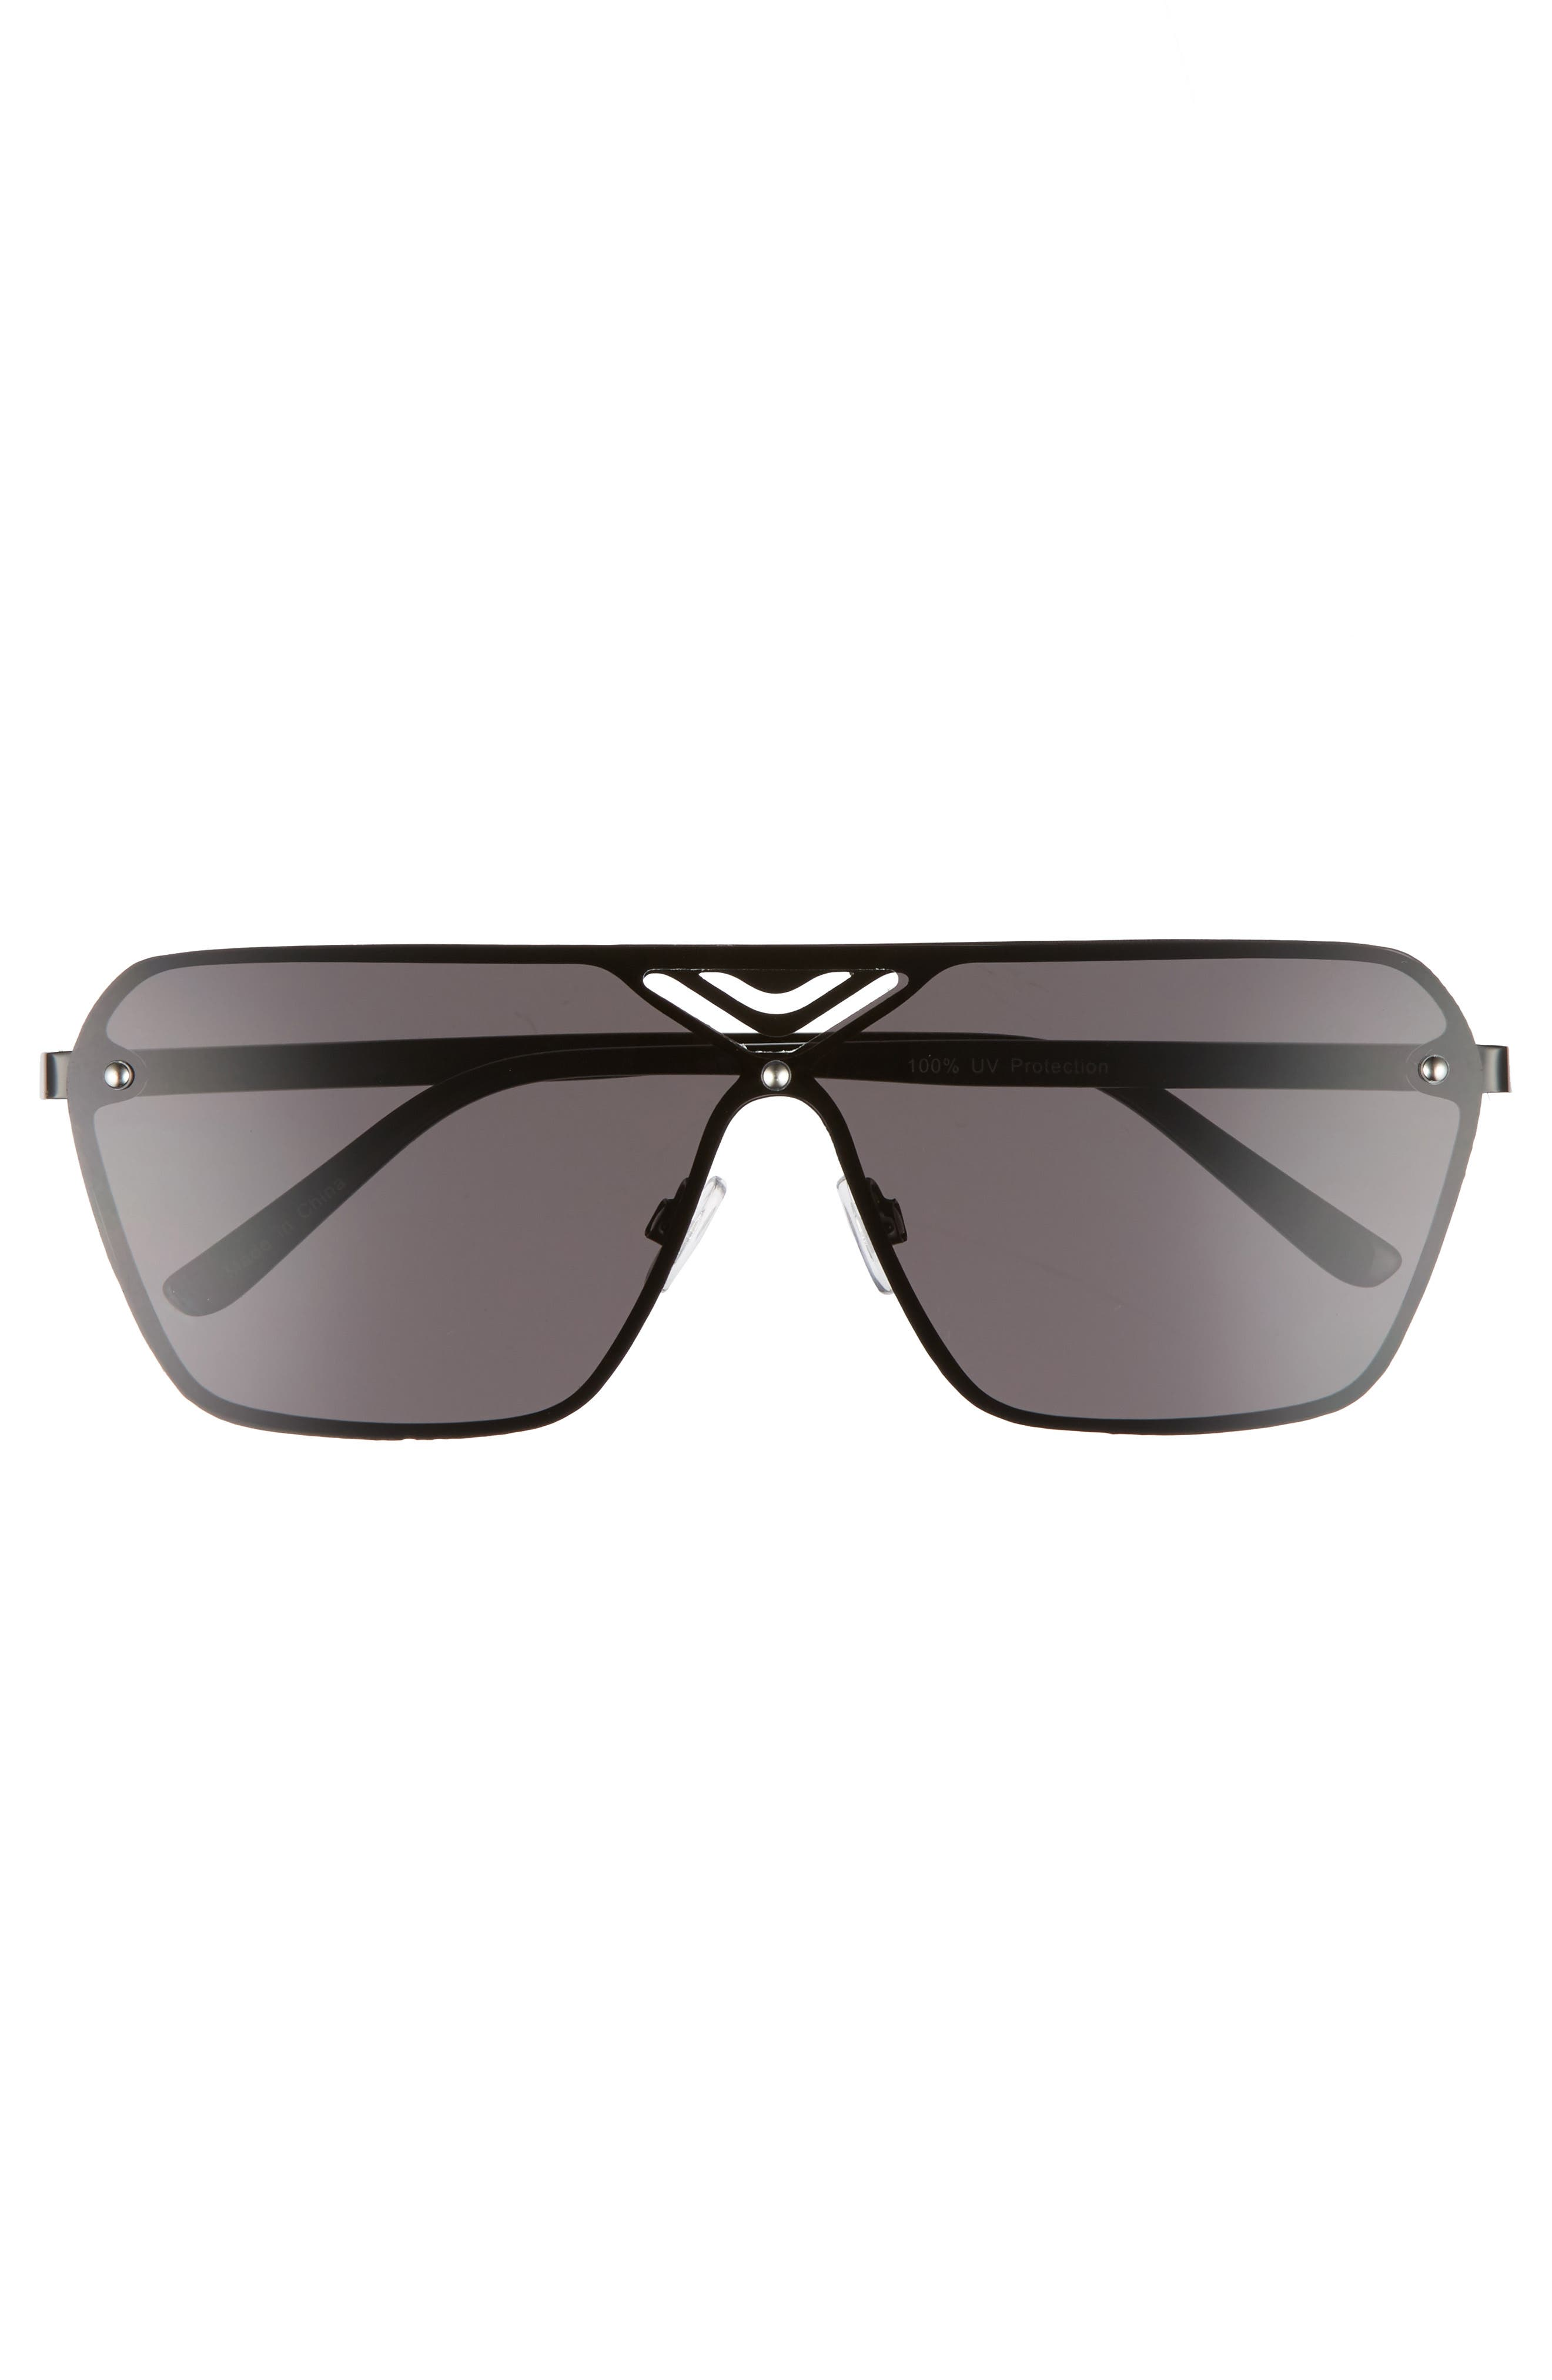 70mm Cutout Shield Sunglasses,                             Alternate thumbnail 3, color,                             Black